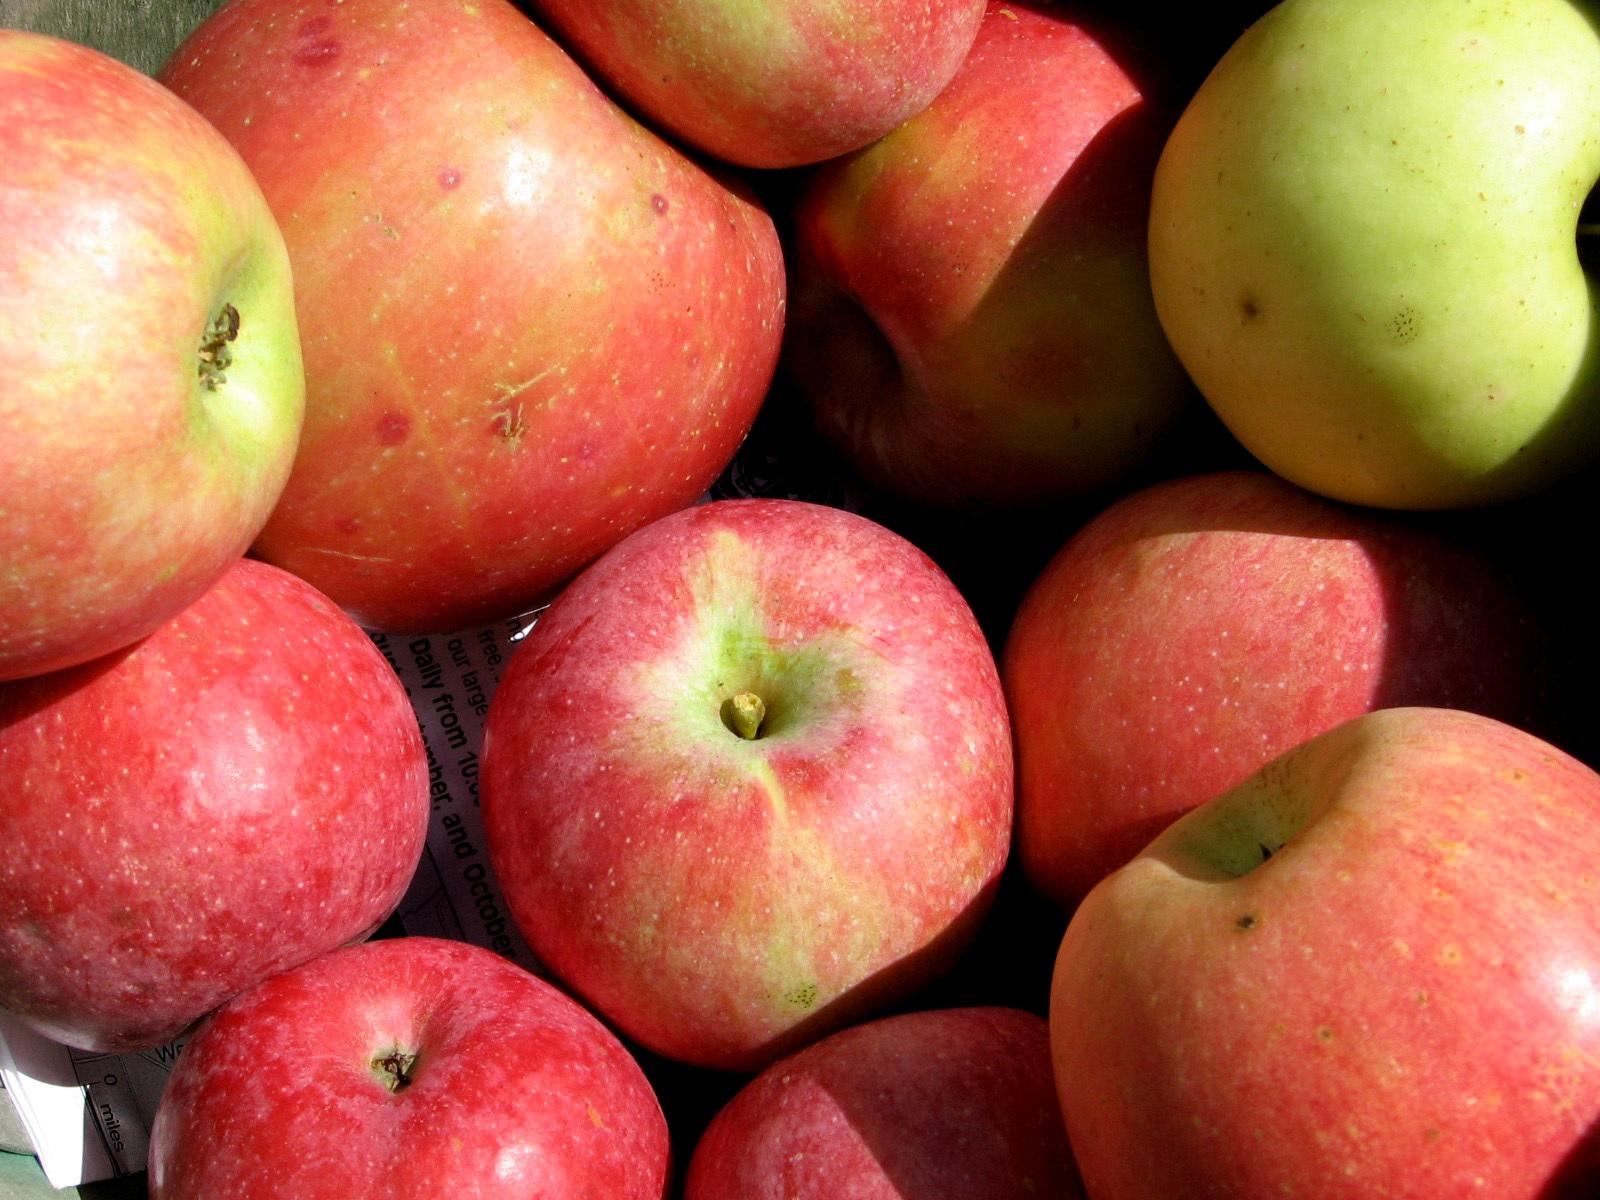 Ziegler's Orchard